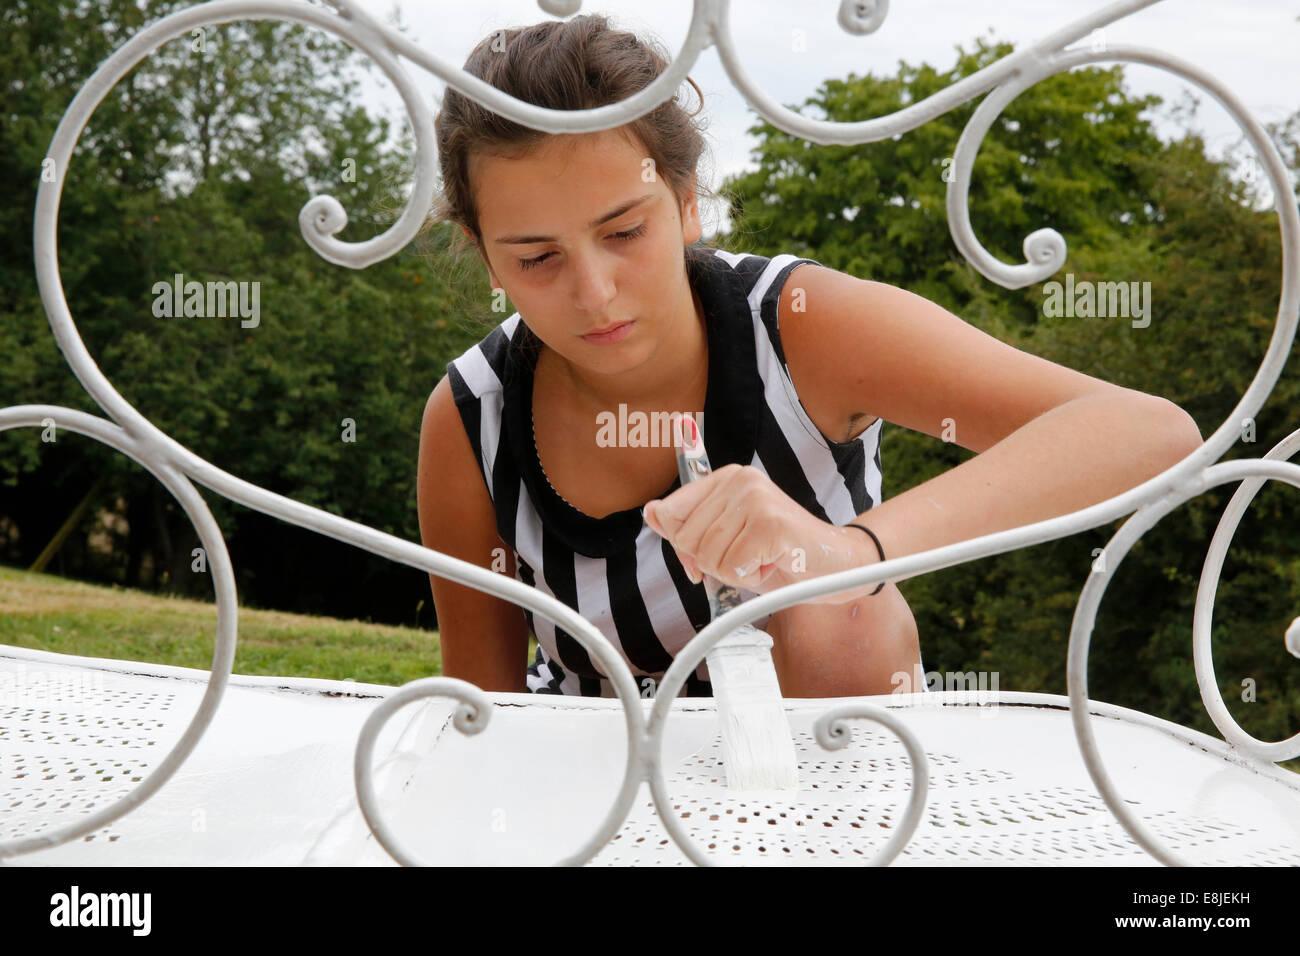 Teenager painting iron furniture - Stock Image